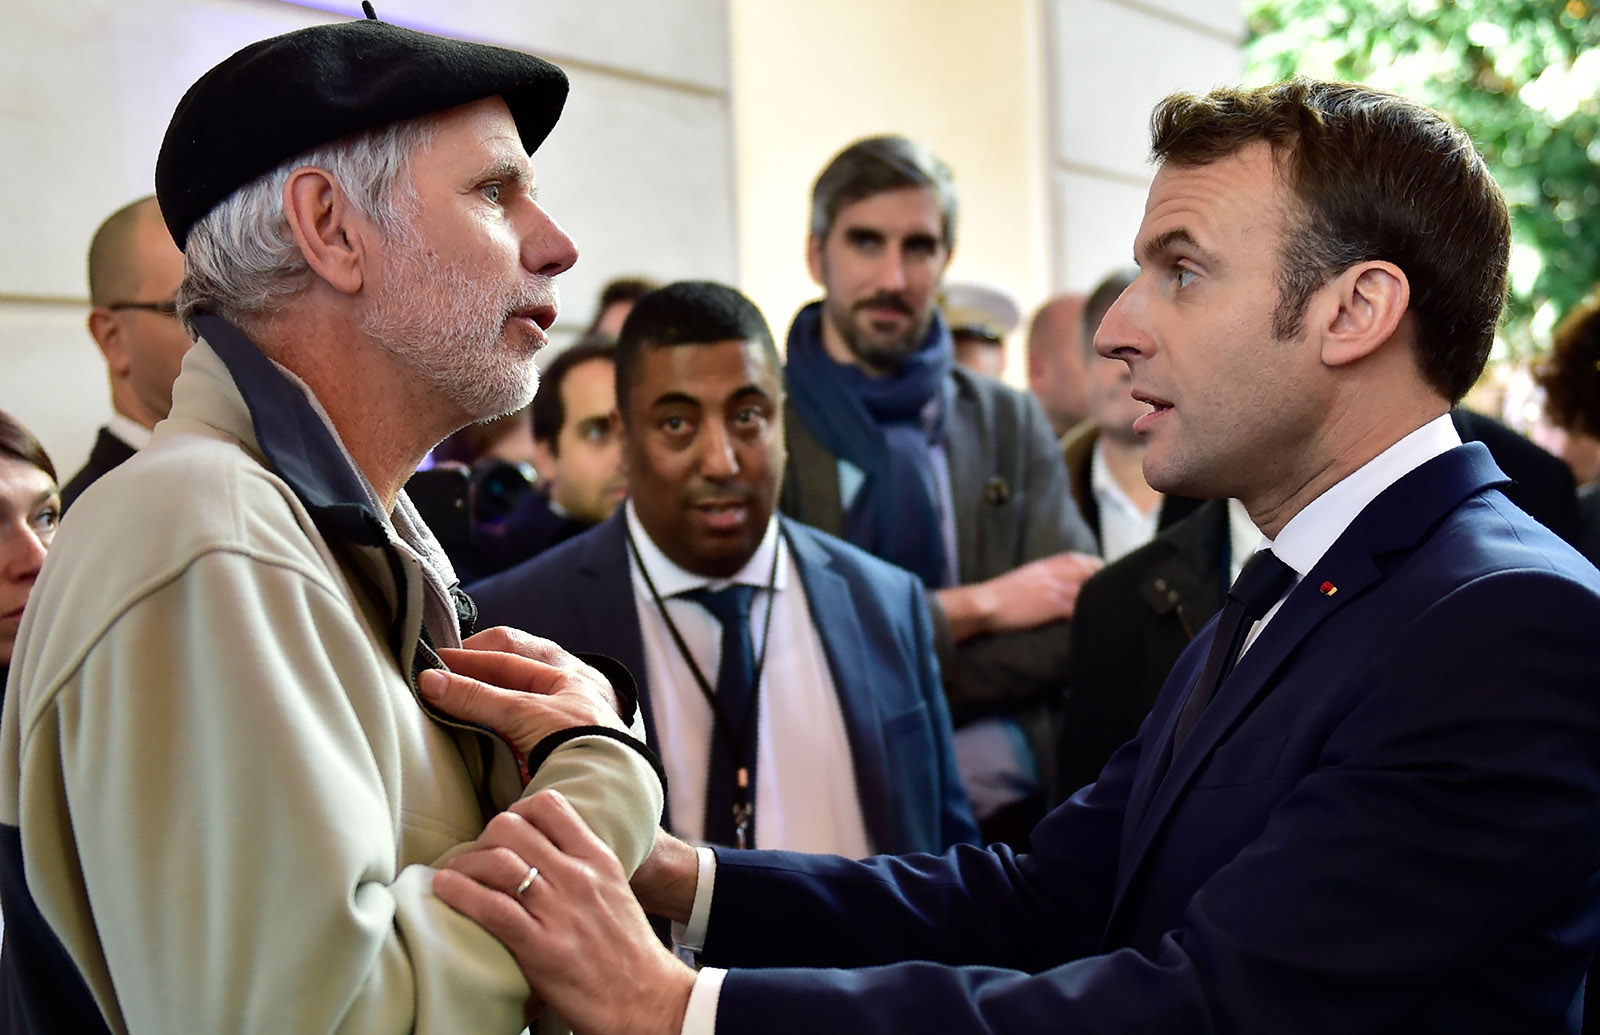 Teacher arguing with Emmanuel Macron over pension reforms